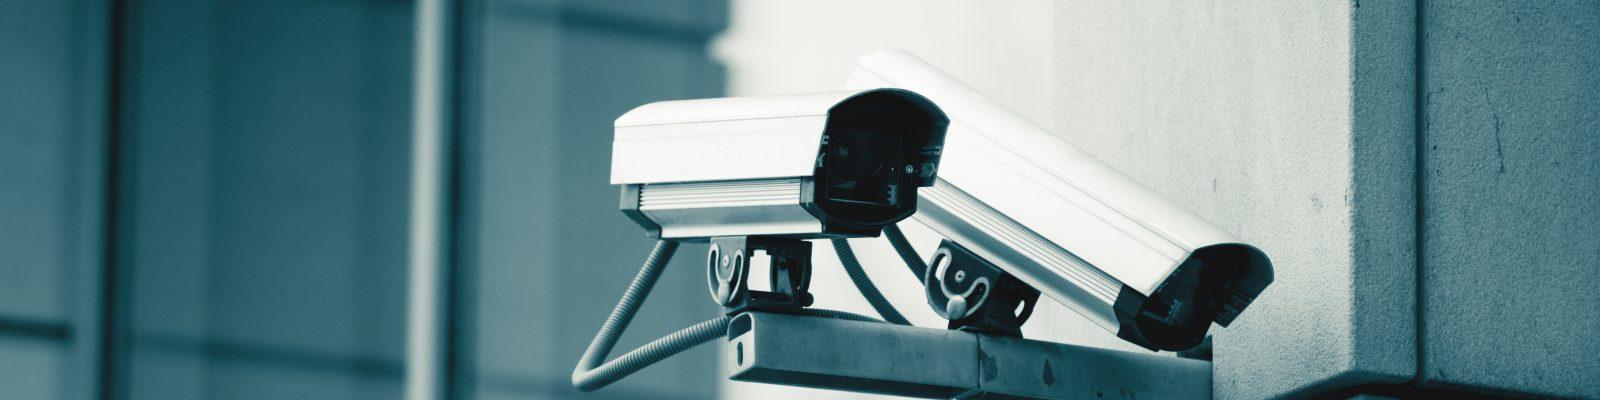 Surveillance cameras of a bank